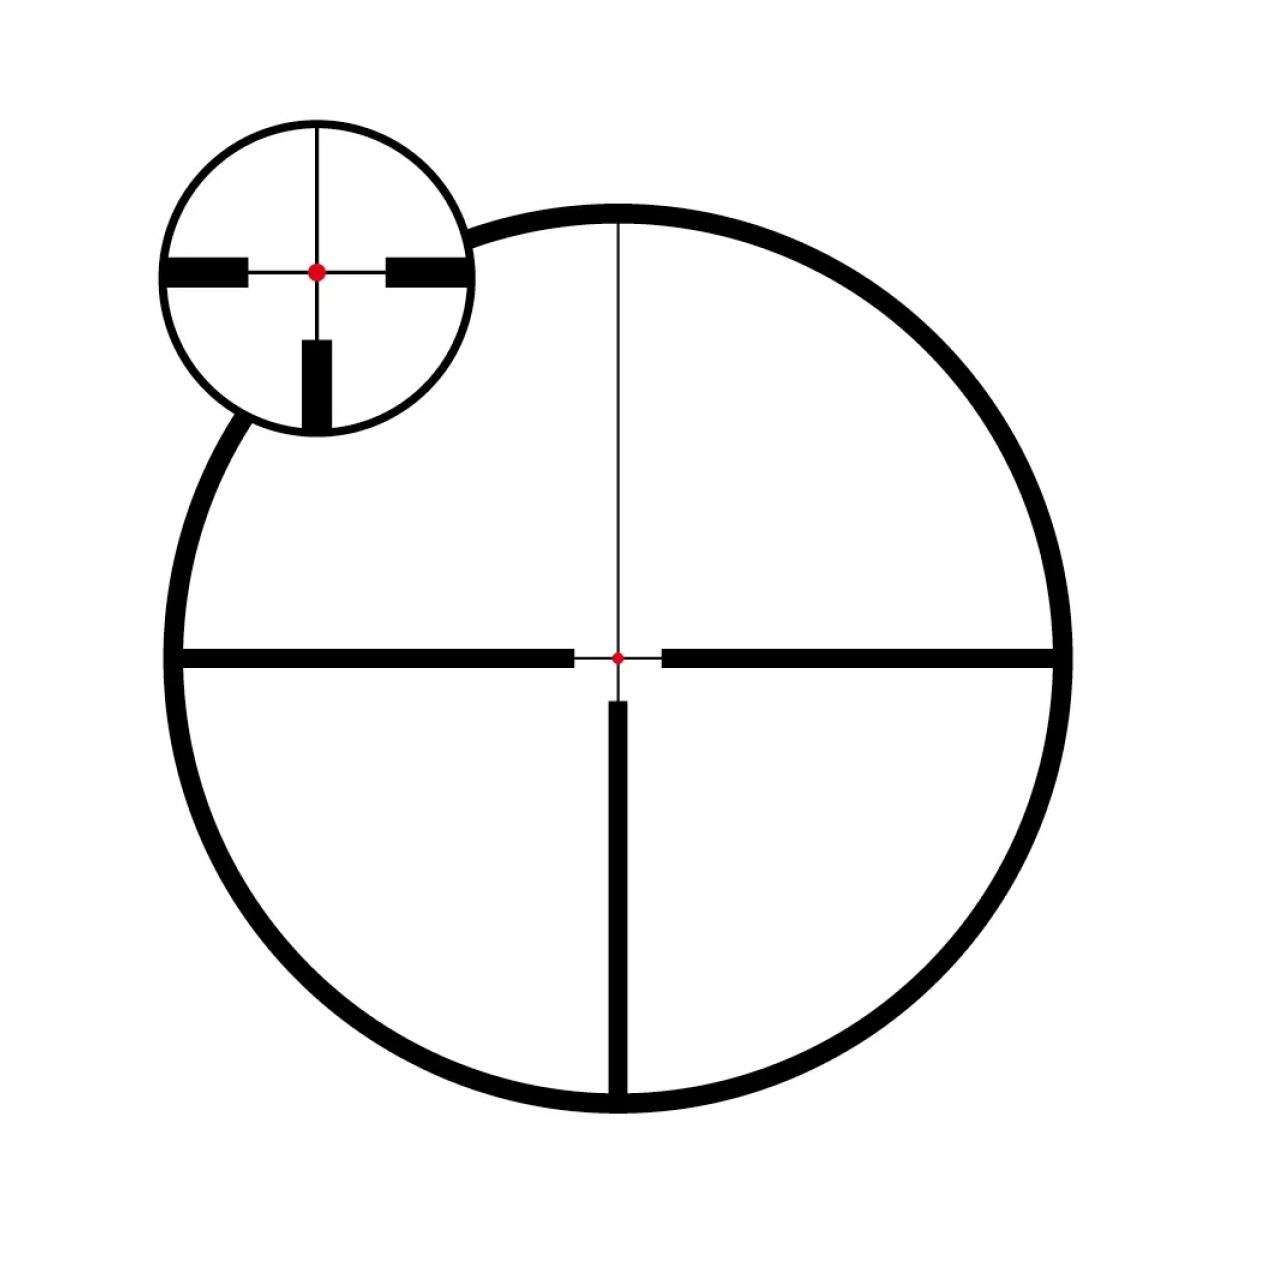 Meopta Optika6 2.5-15×44 Illuminated 4C 30mm SFP Riflescope